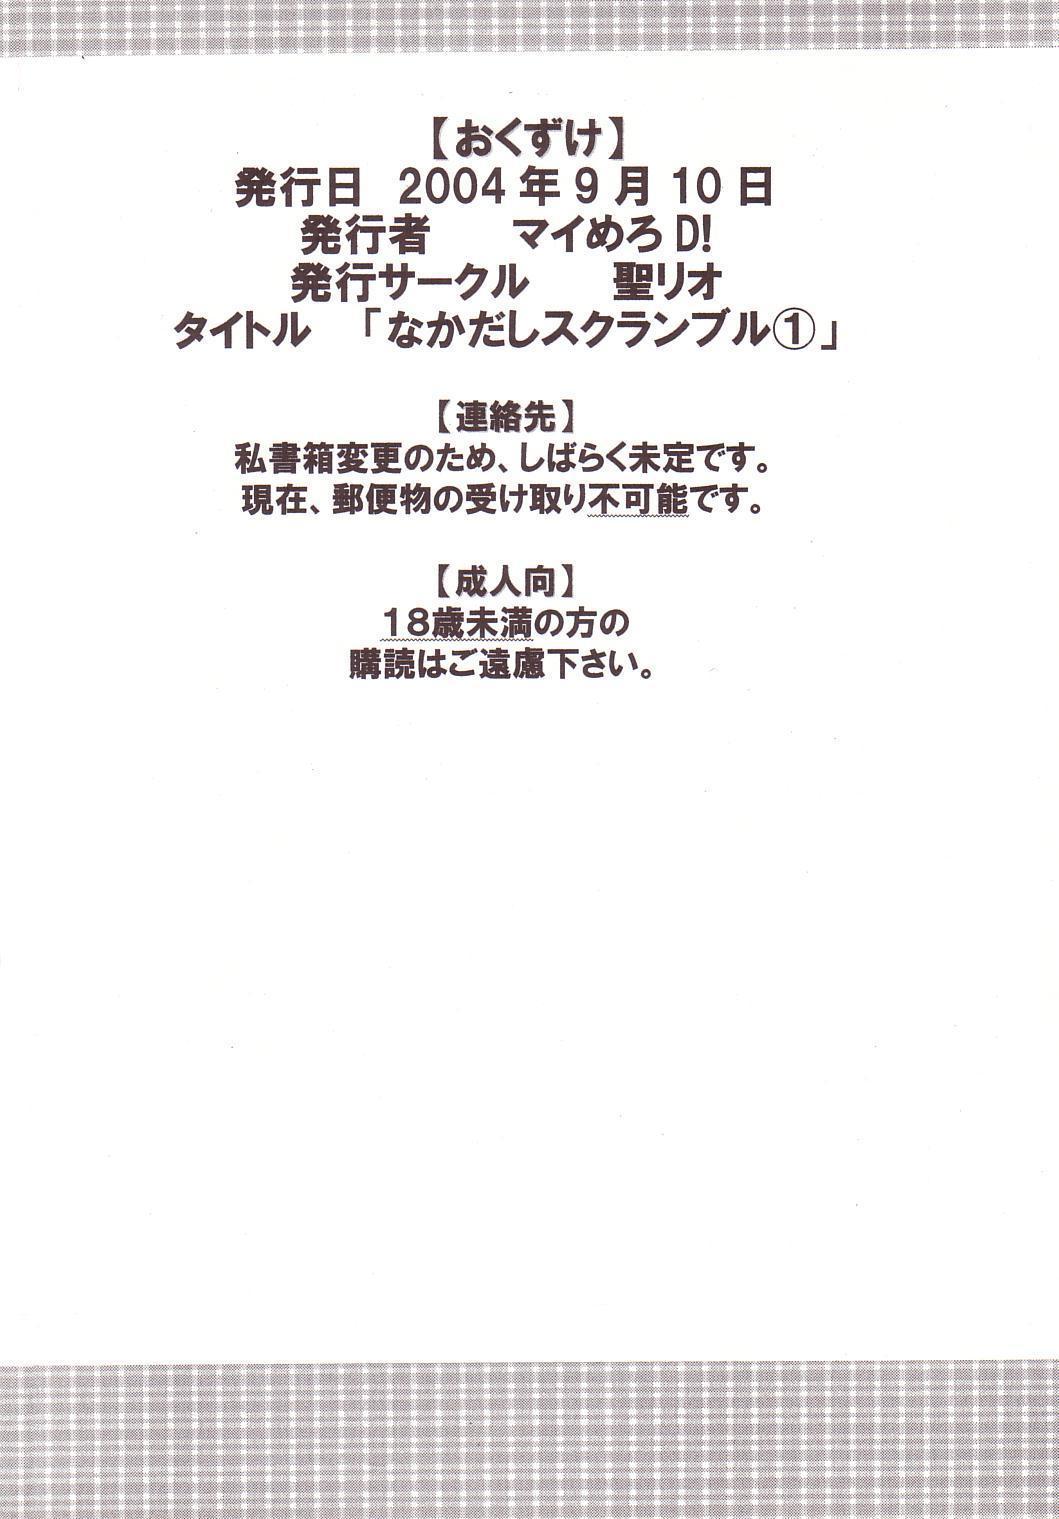 Nakadashi Scramble 56